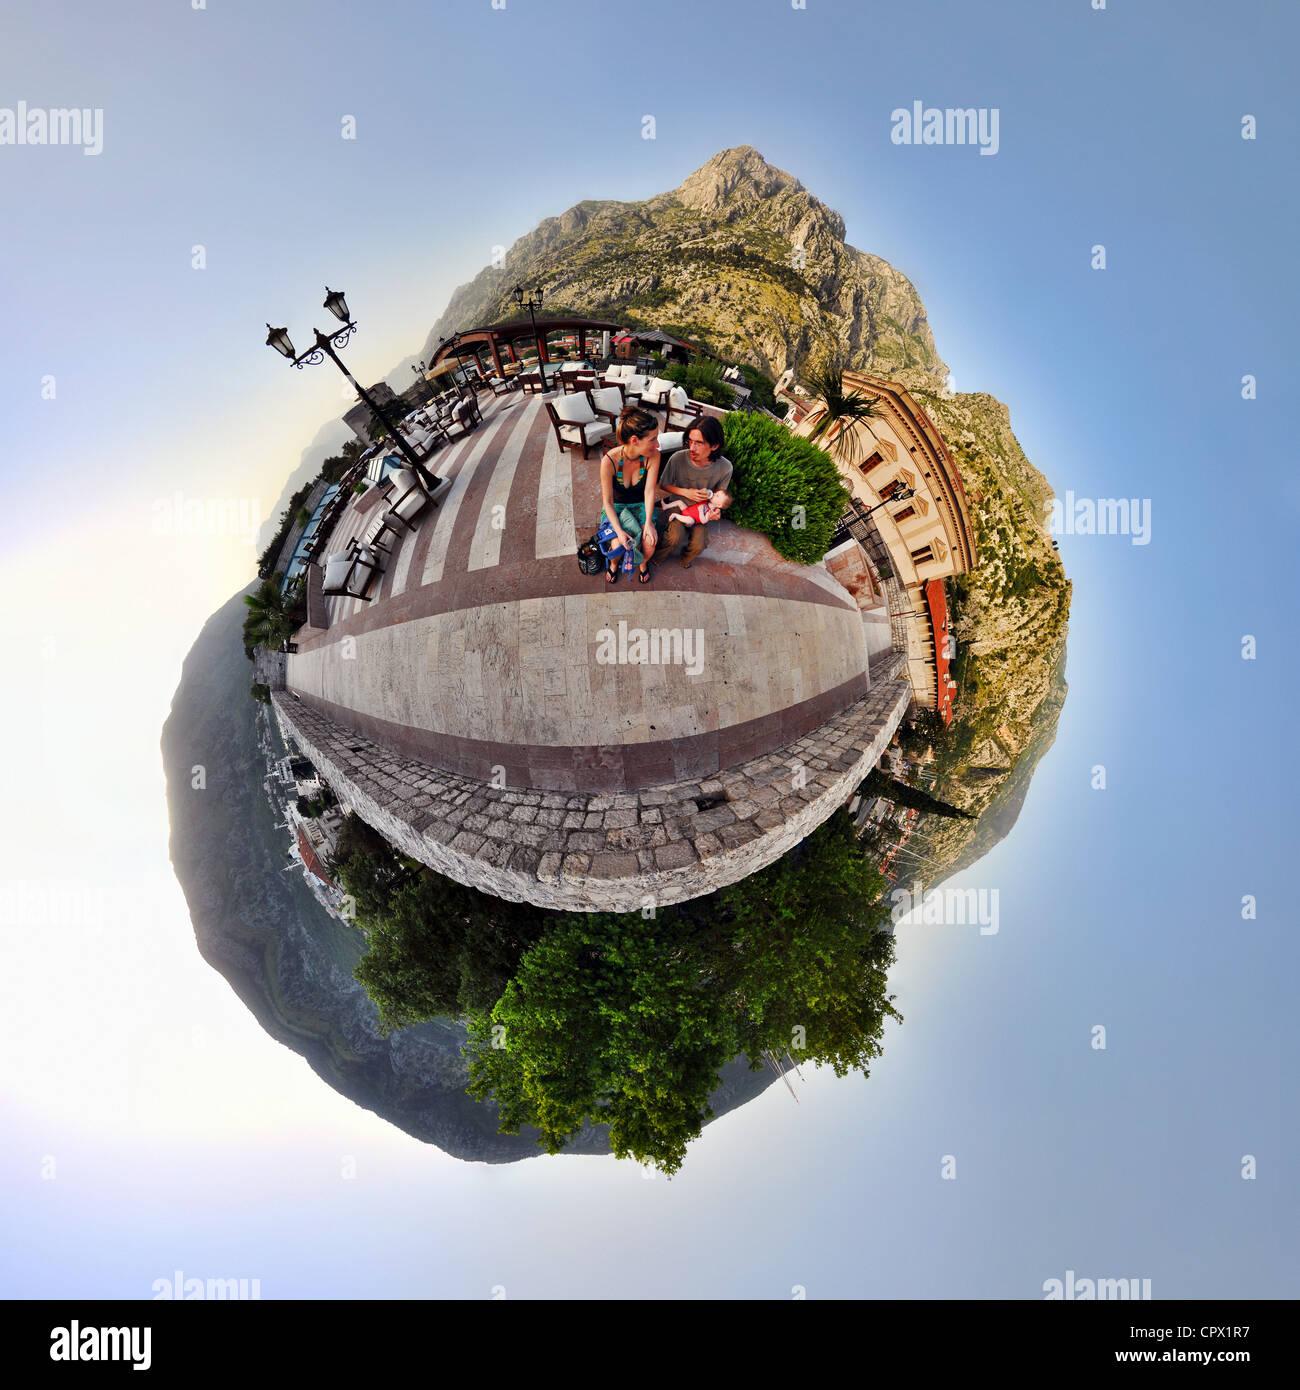 Familie im Urlaub in Kotor, Montenegro, kleine Planeten Effekt Stockbild